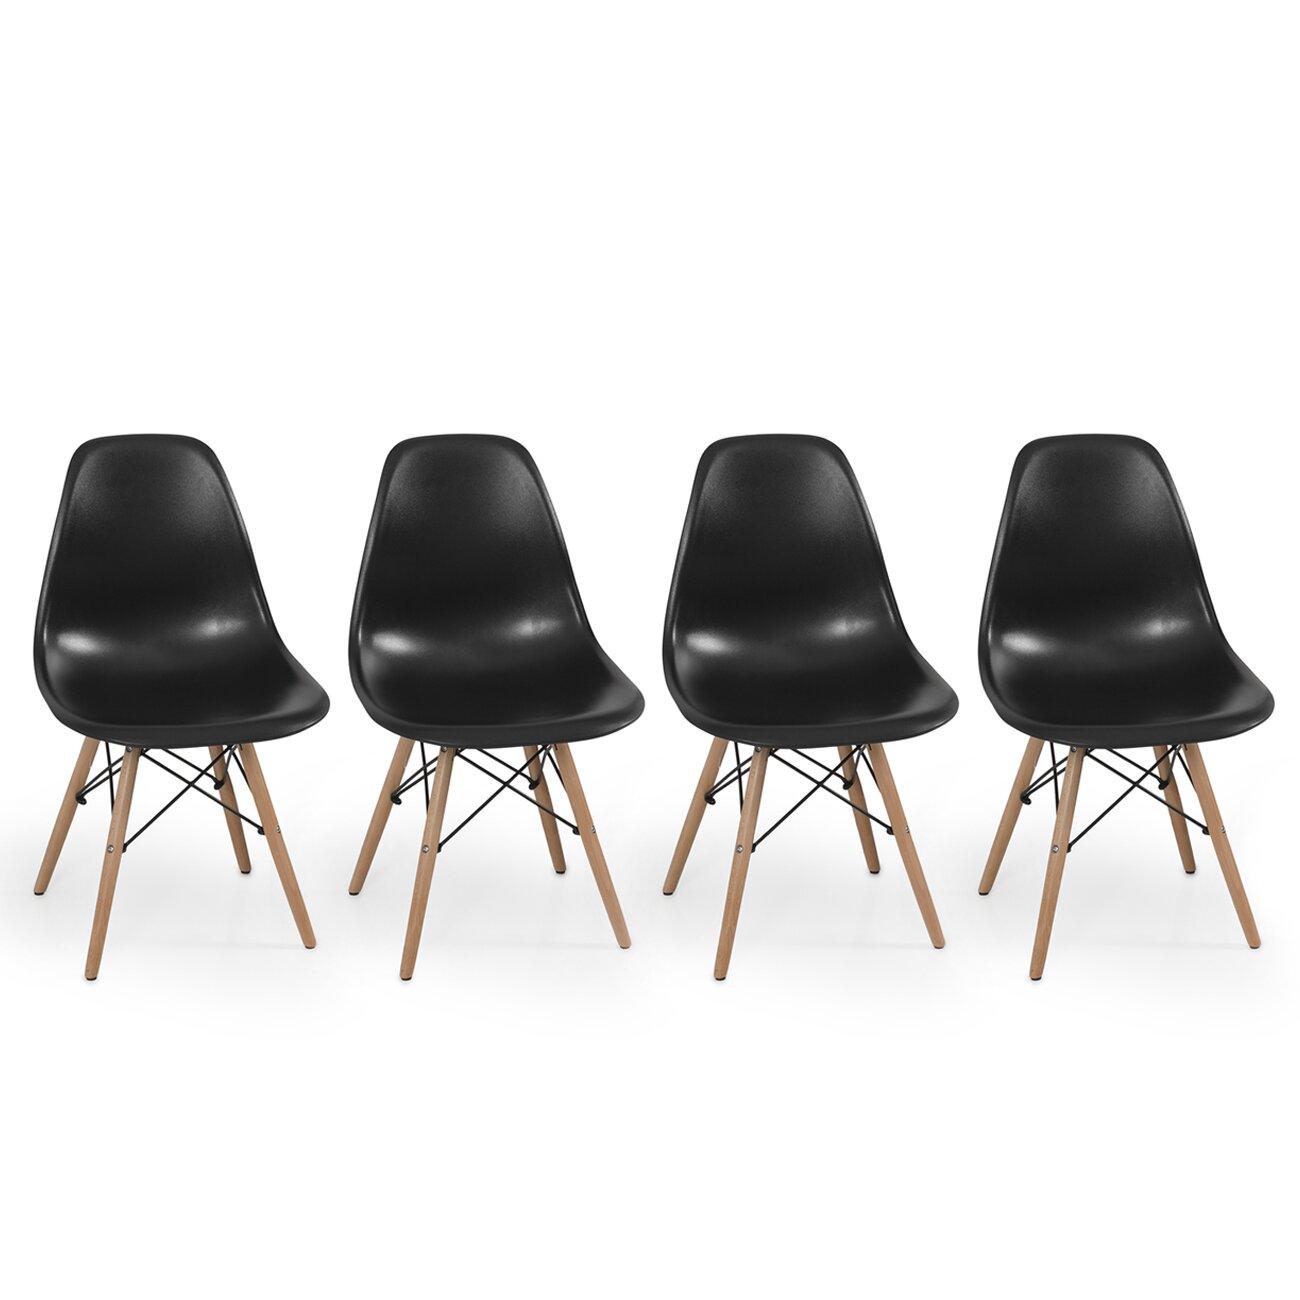 belleze dowel eames side chair reviews wayfair. Black Bedroom Furniture Sets. Home Design Ideas